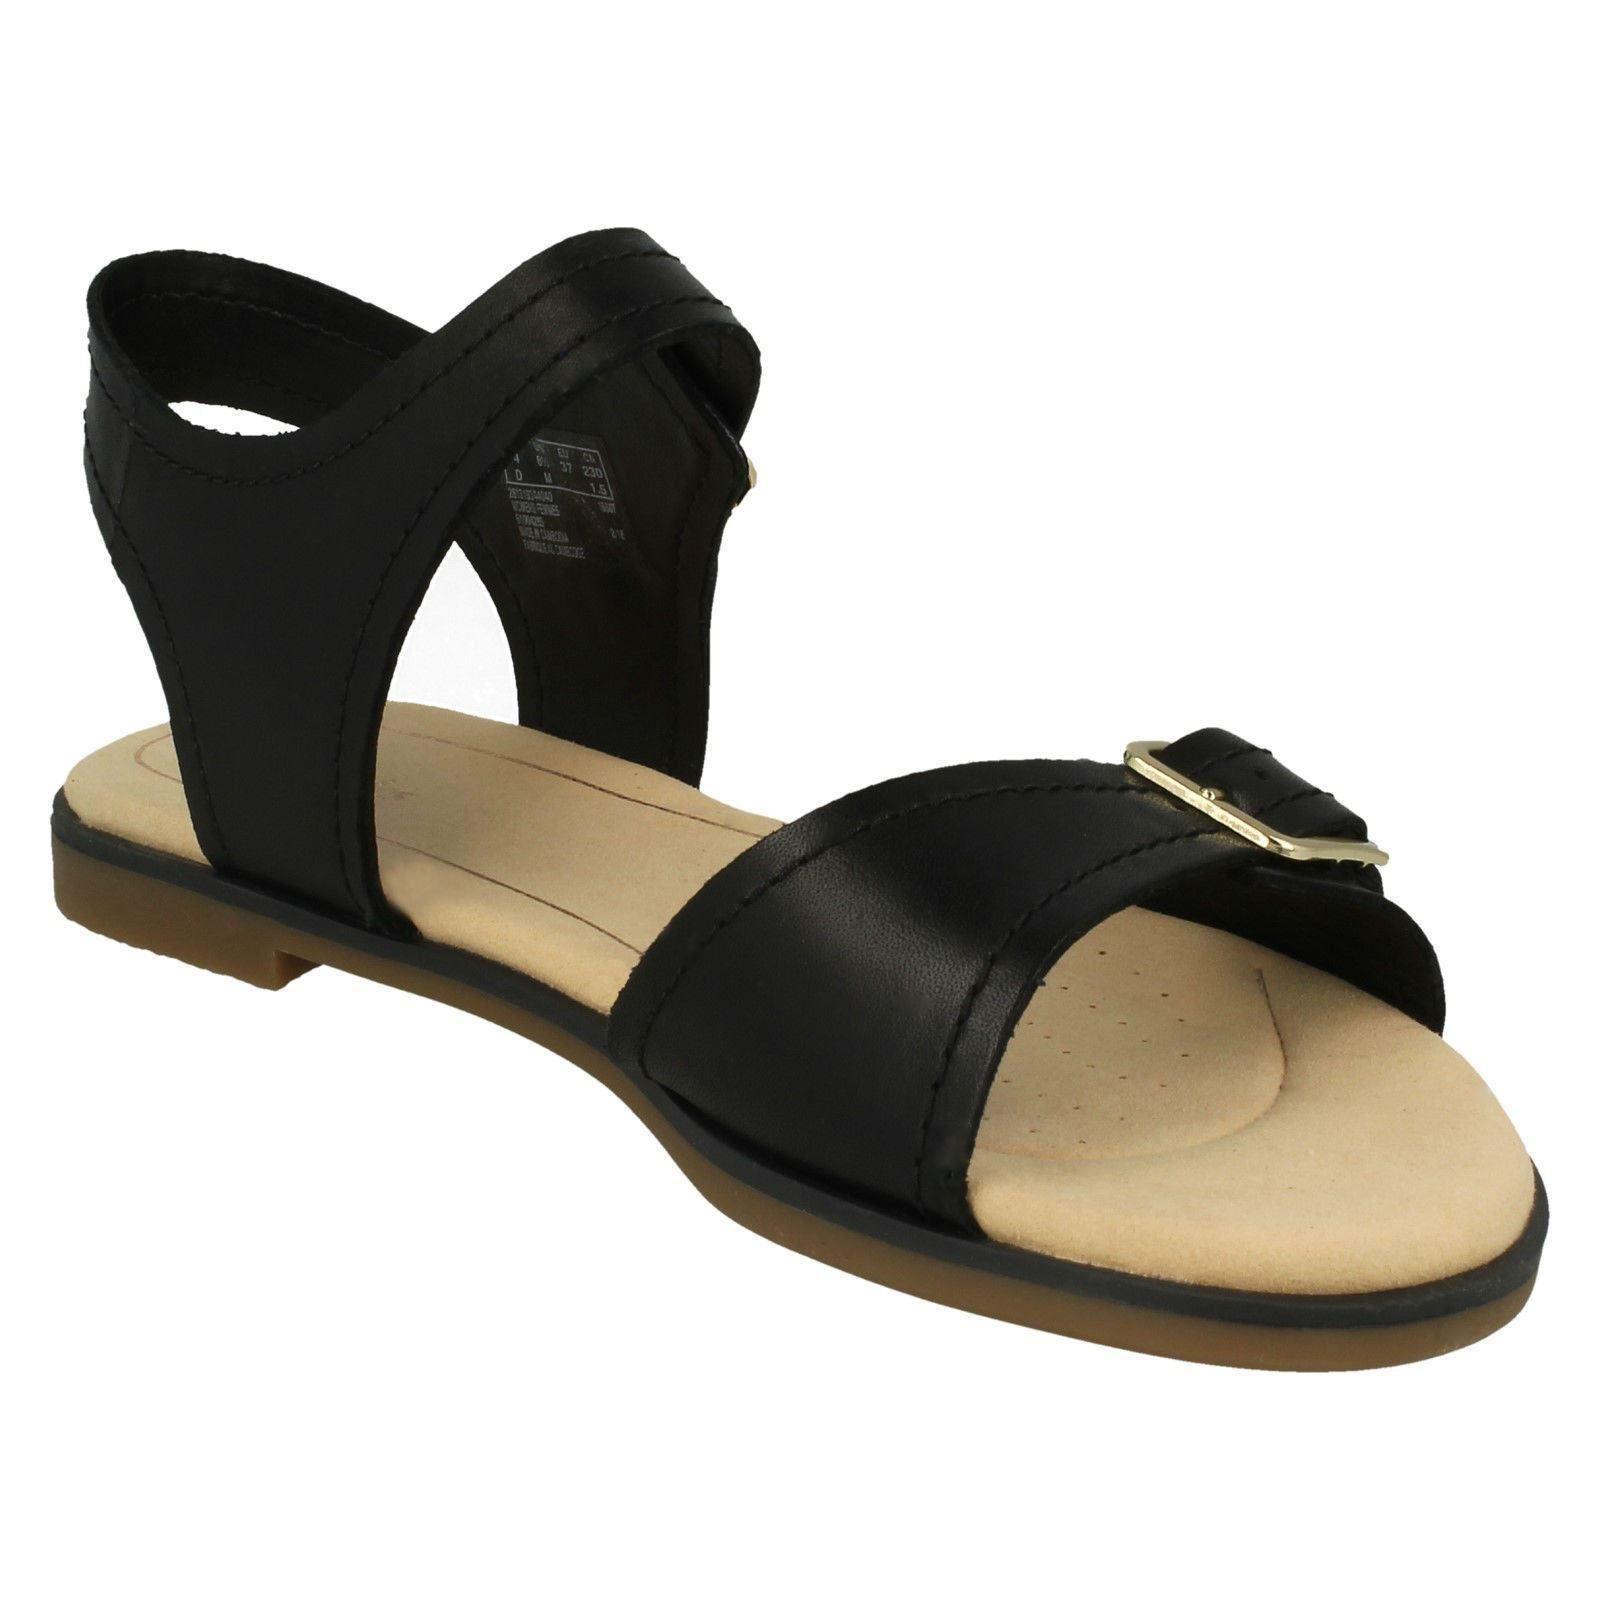 Ladies Clarks Casual Slingback Sandal Bay Primrose